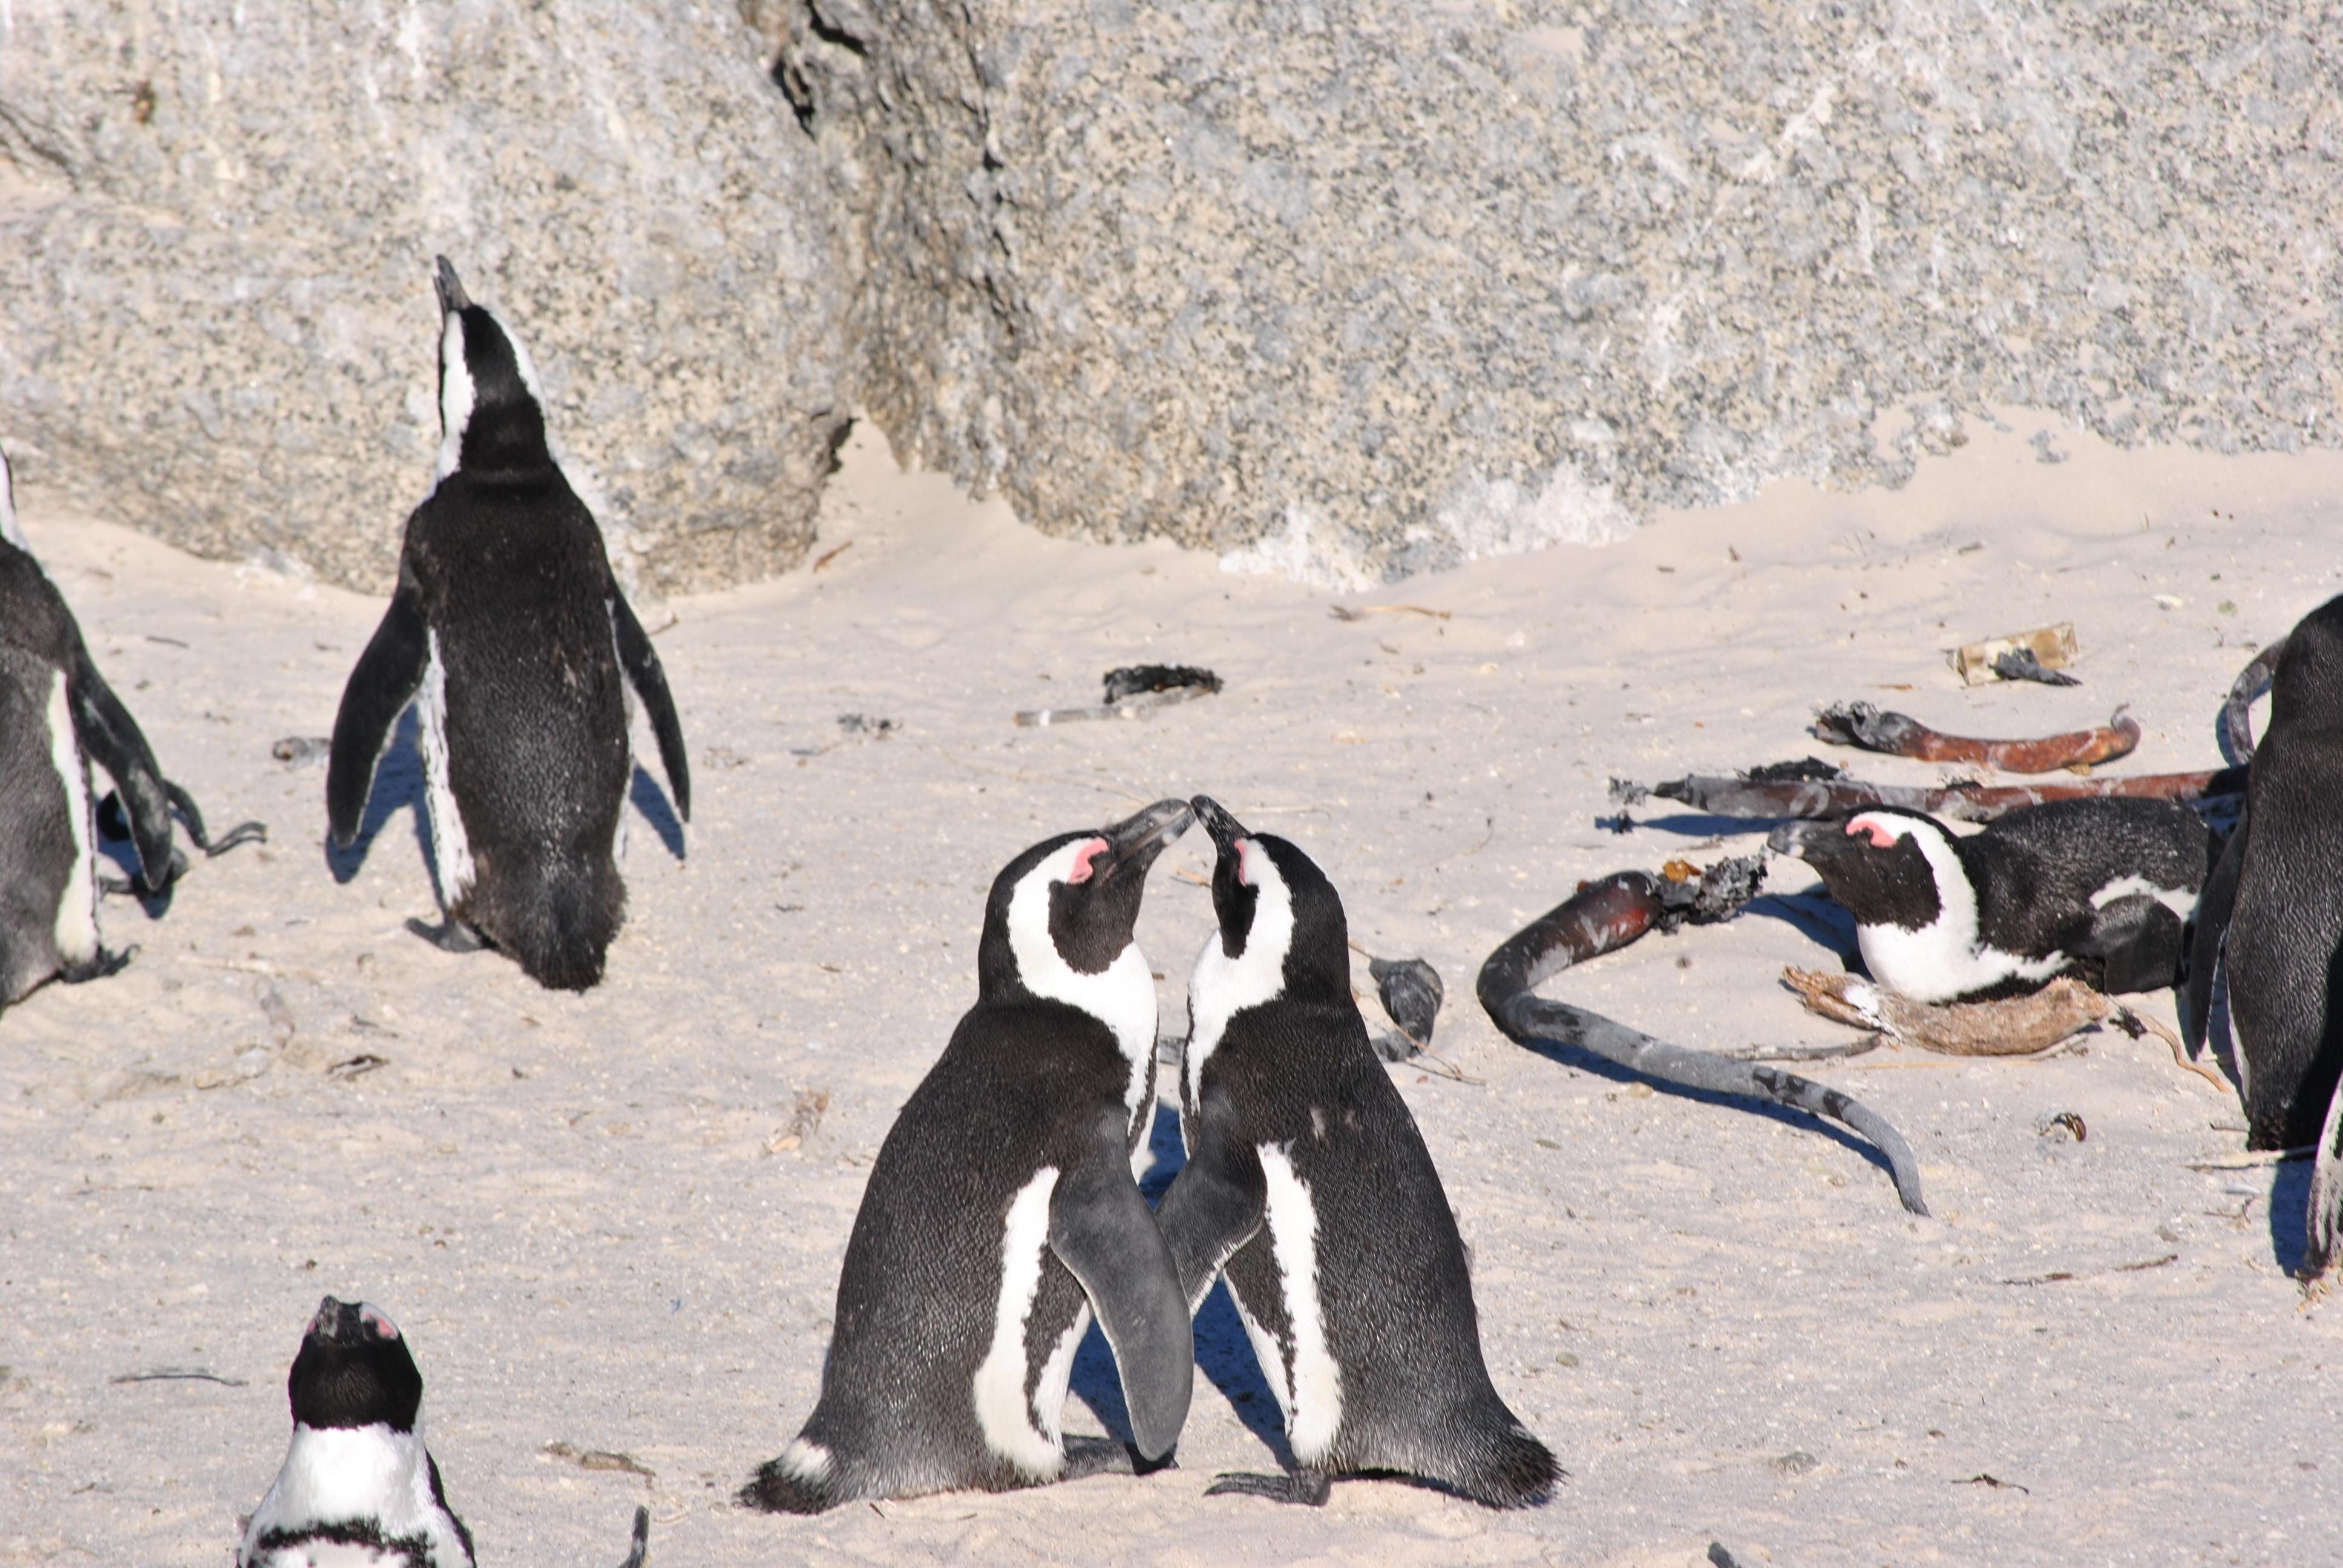 walk like penguins in love